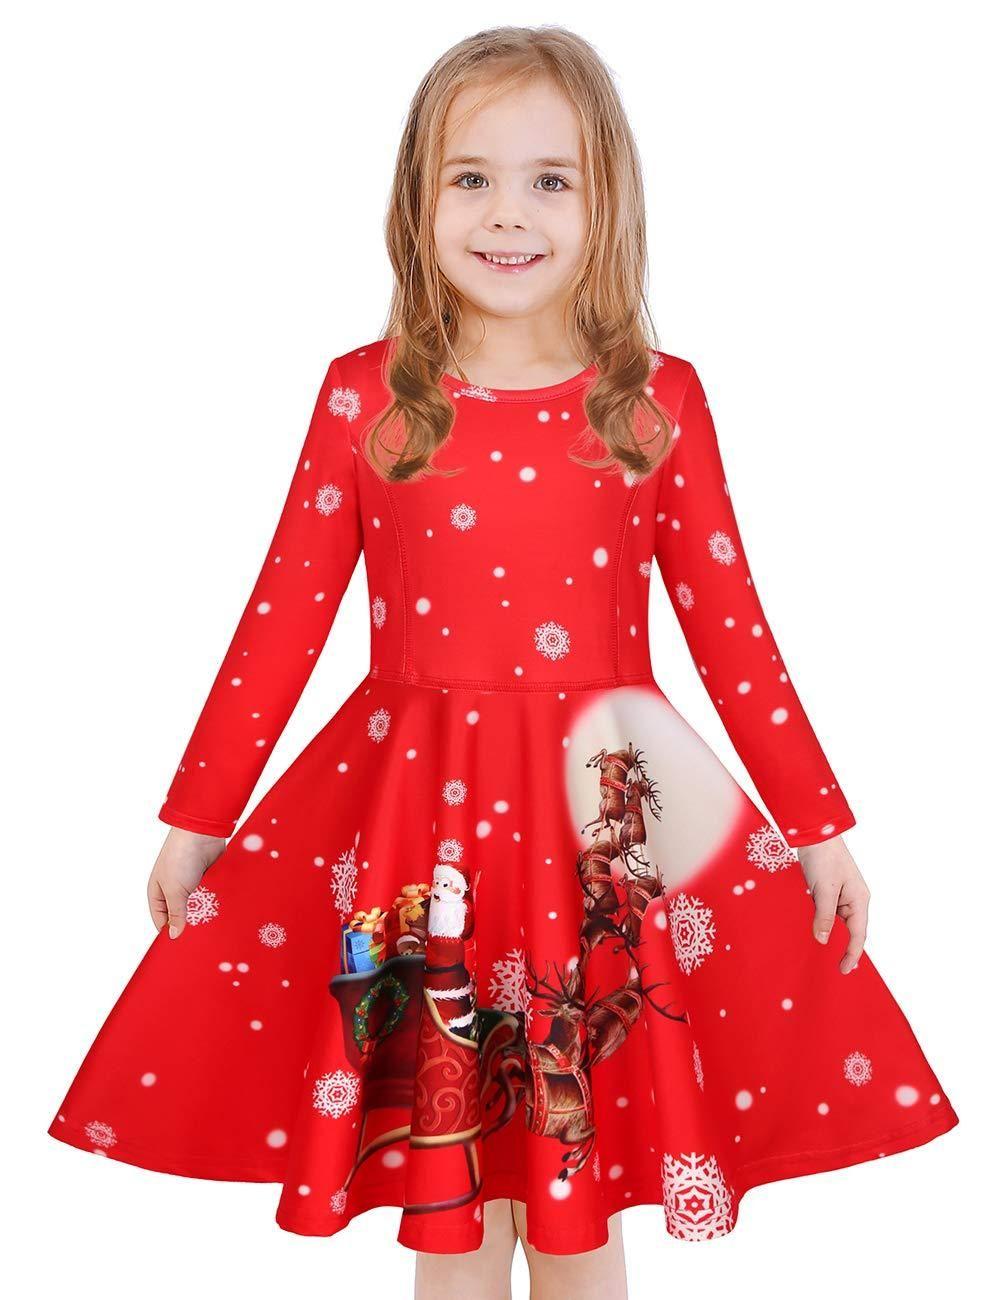 Girls Twirly Longsleeve Christmas Dress Santa Sleigh Richrichardsonretail Girls Christmas Dresses Girls Dresses Long Sleeve Kids [ 1300 x 1000 Pixel ]